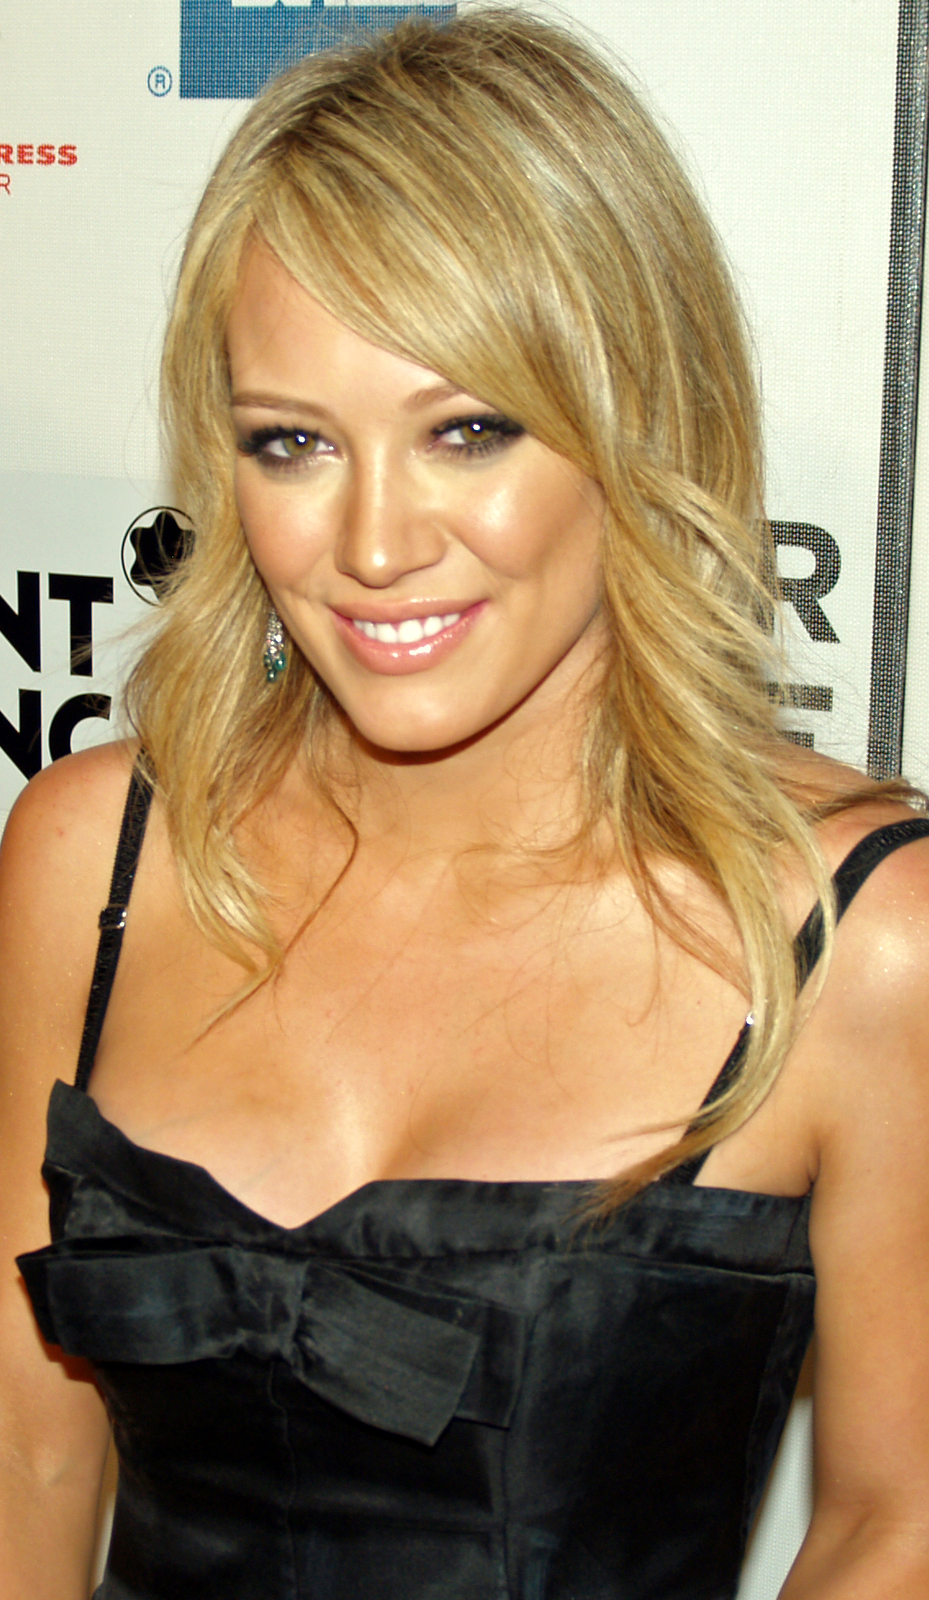 Depiction of Hilary Duff